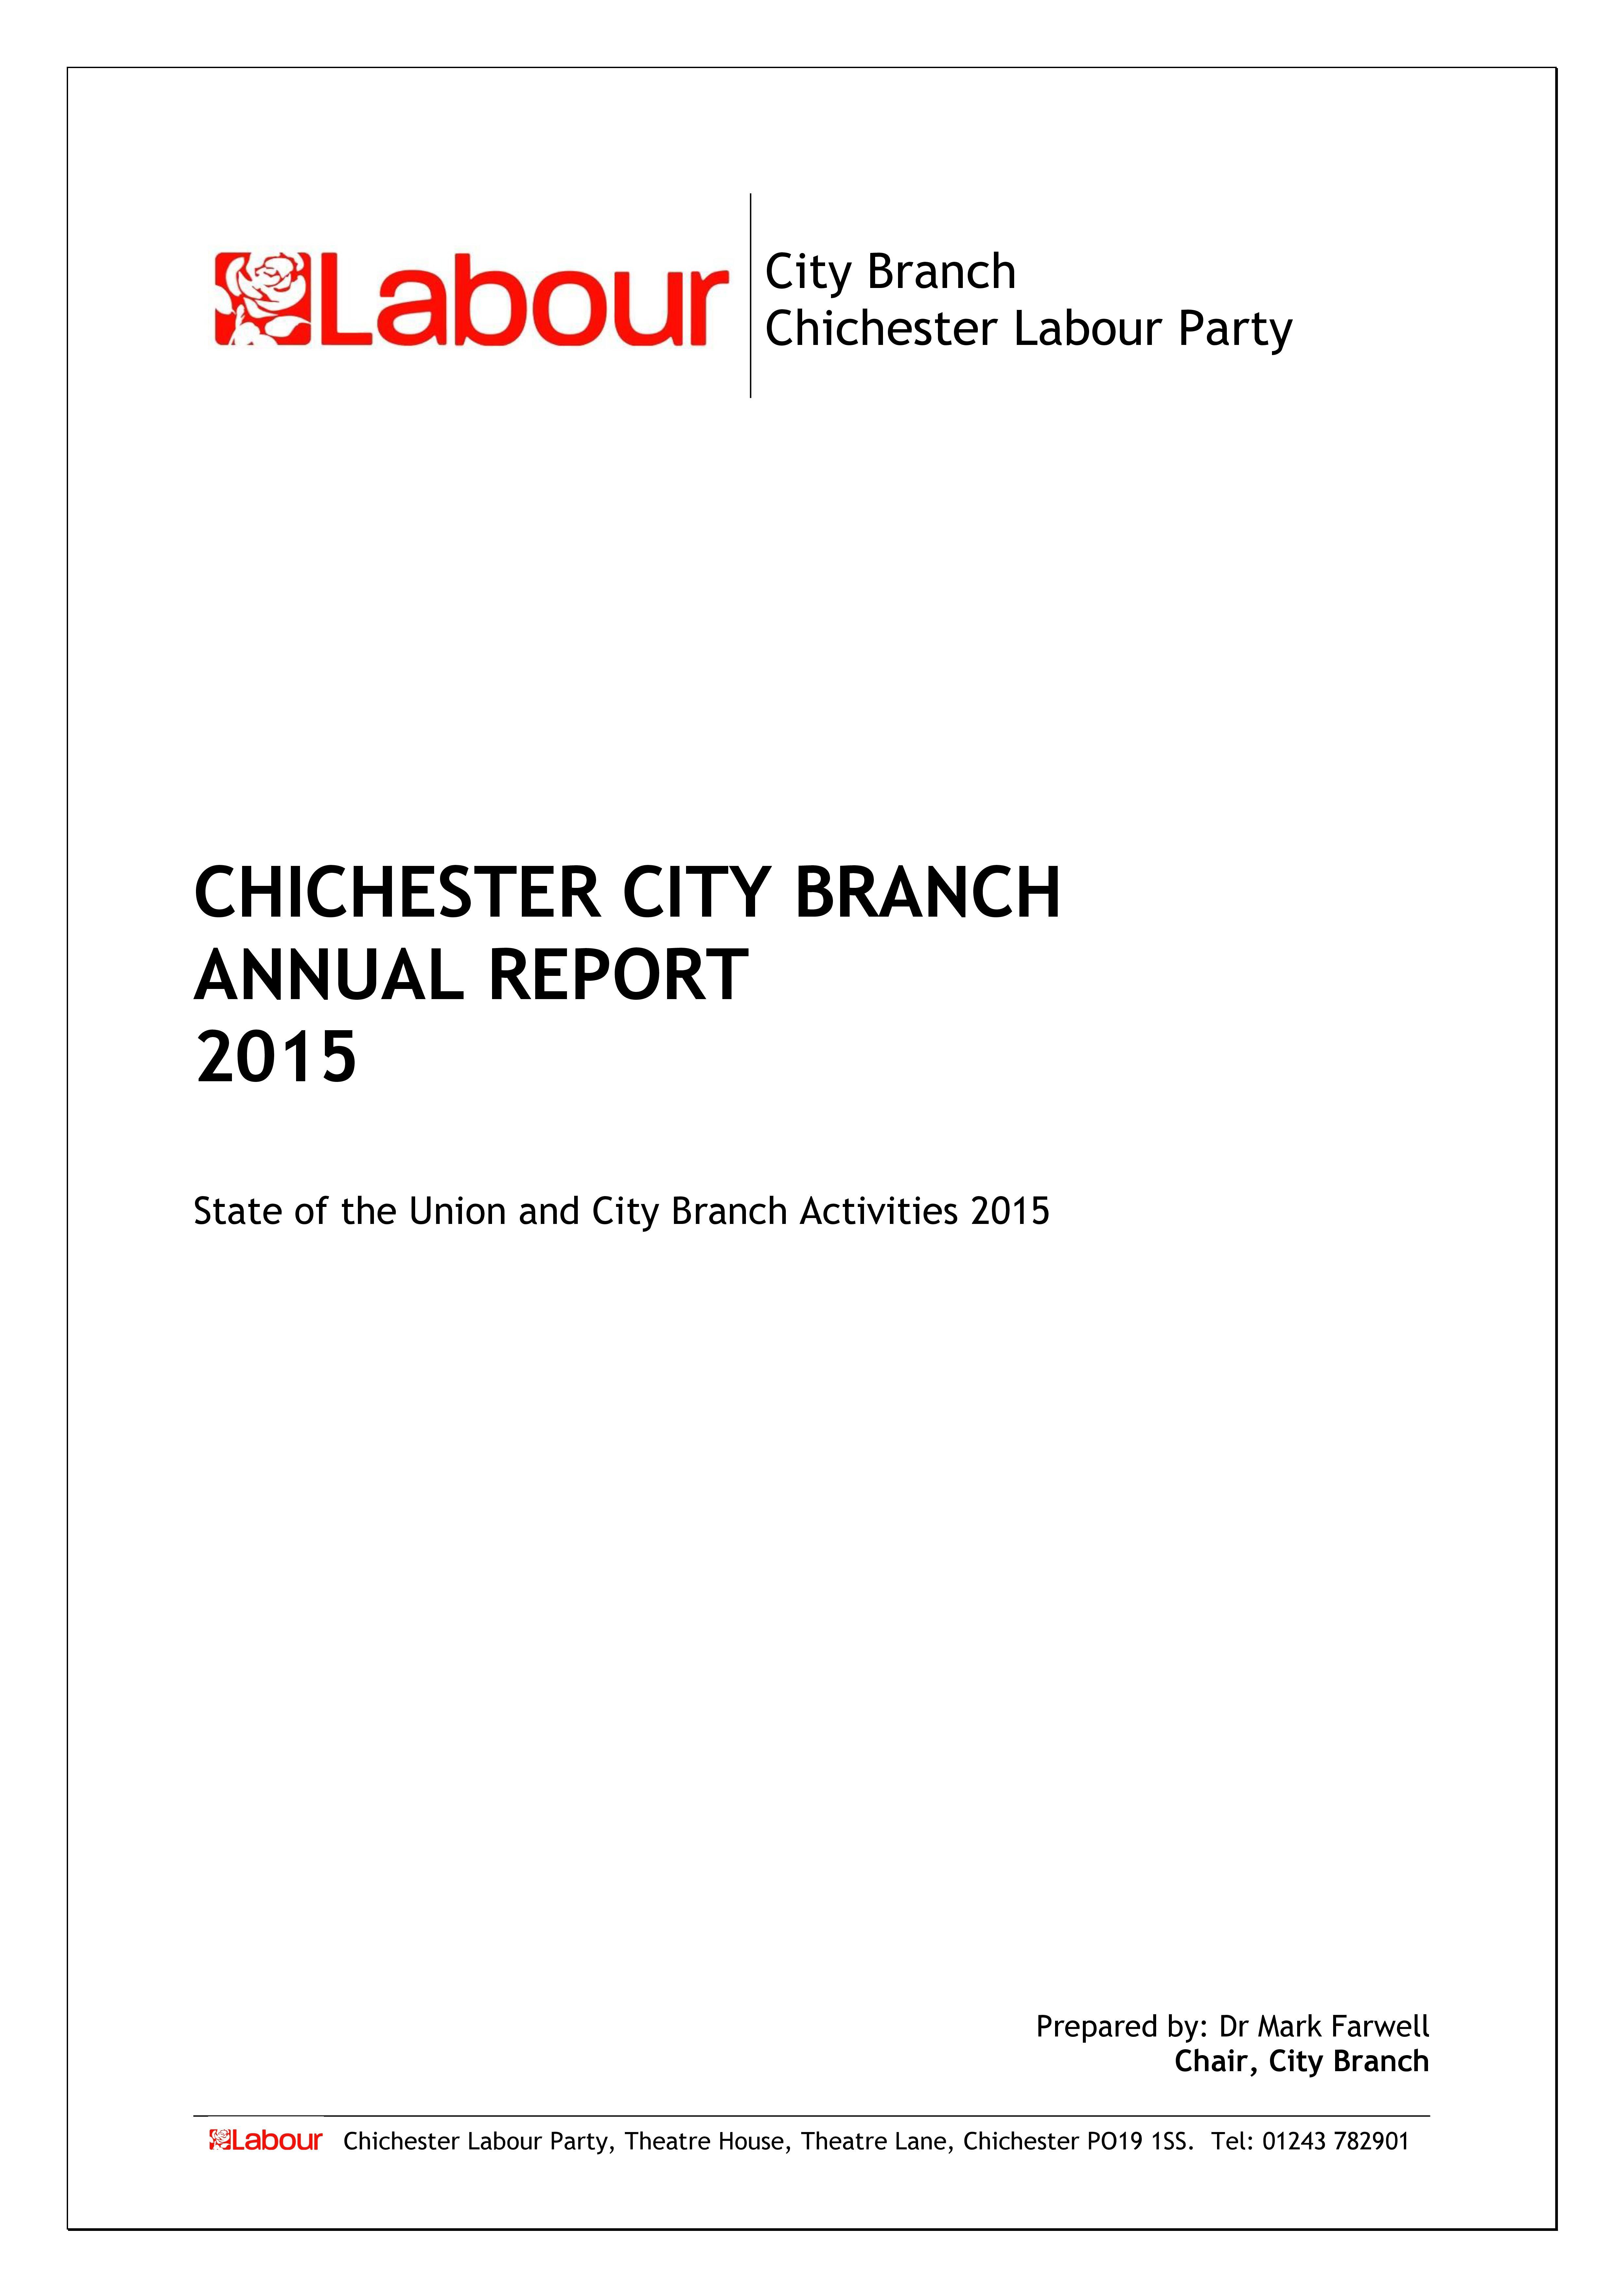 Annual_Report_2015_frontsheet_2.jpg